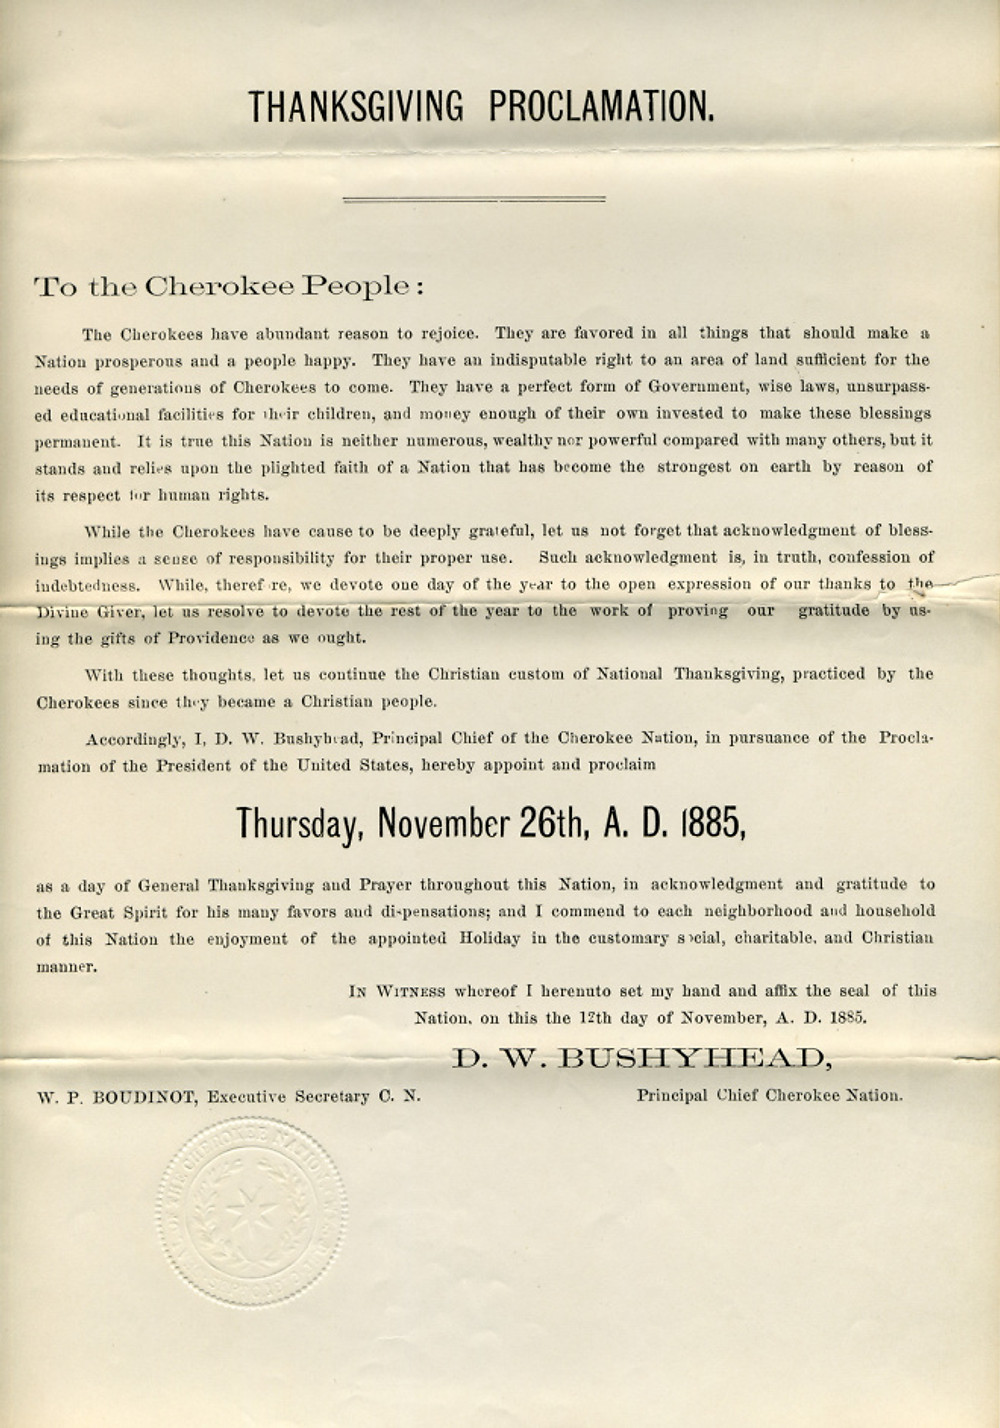 thanksgiving1885-Lisa Christiansen